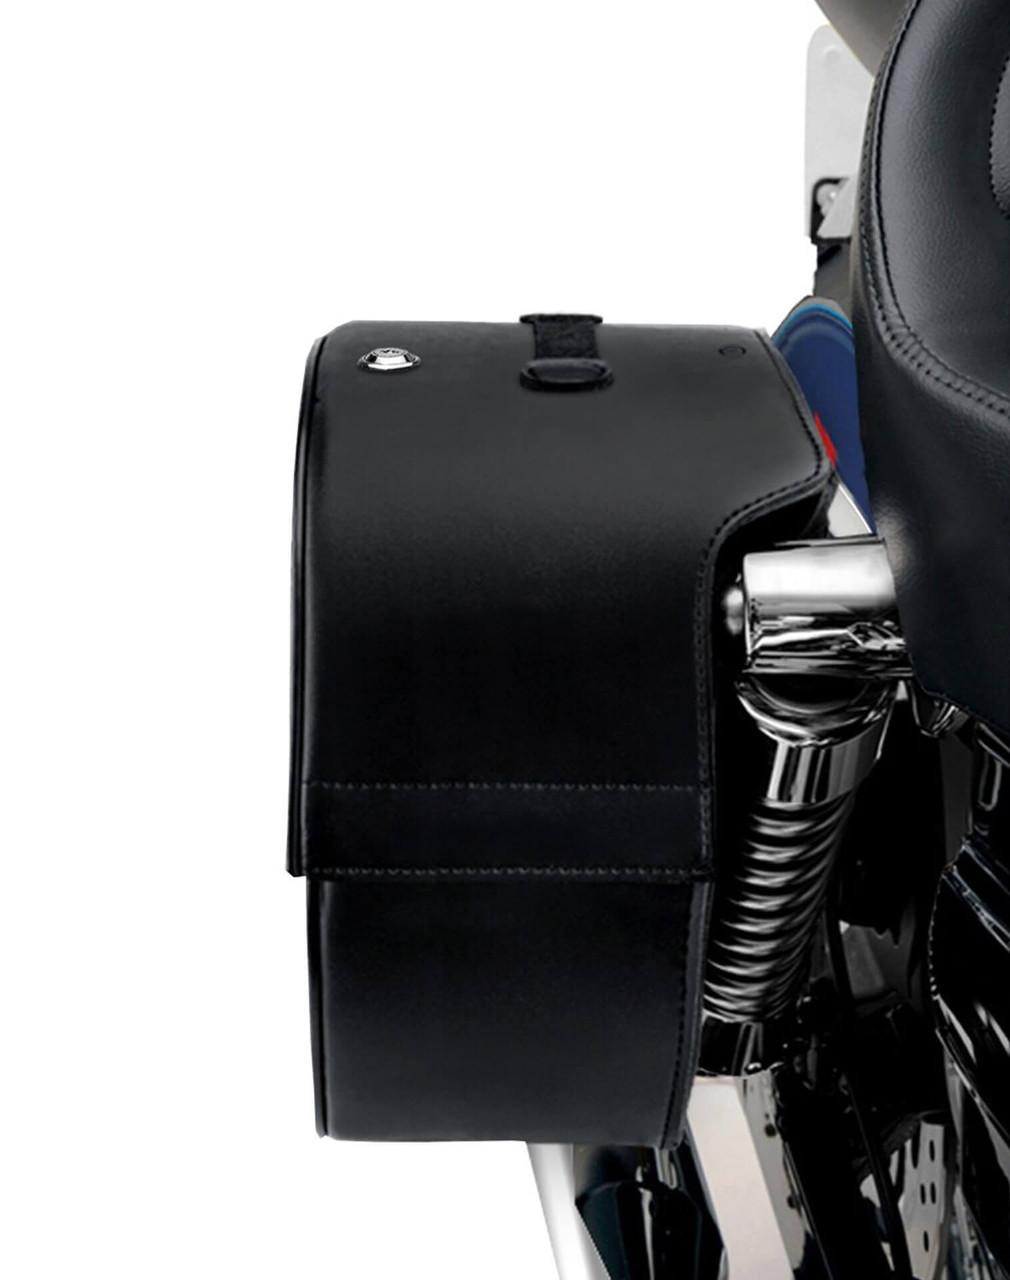 Triumph Thunderbird Shock Cutout Studded Motorcycle Saddlebags Shock Cutout View